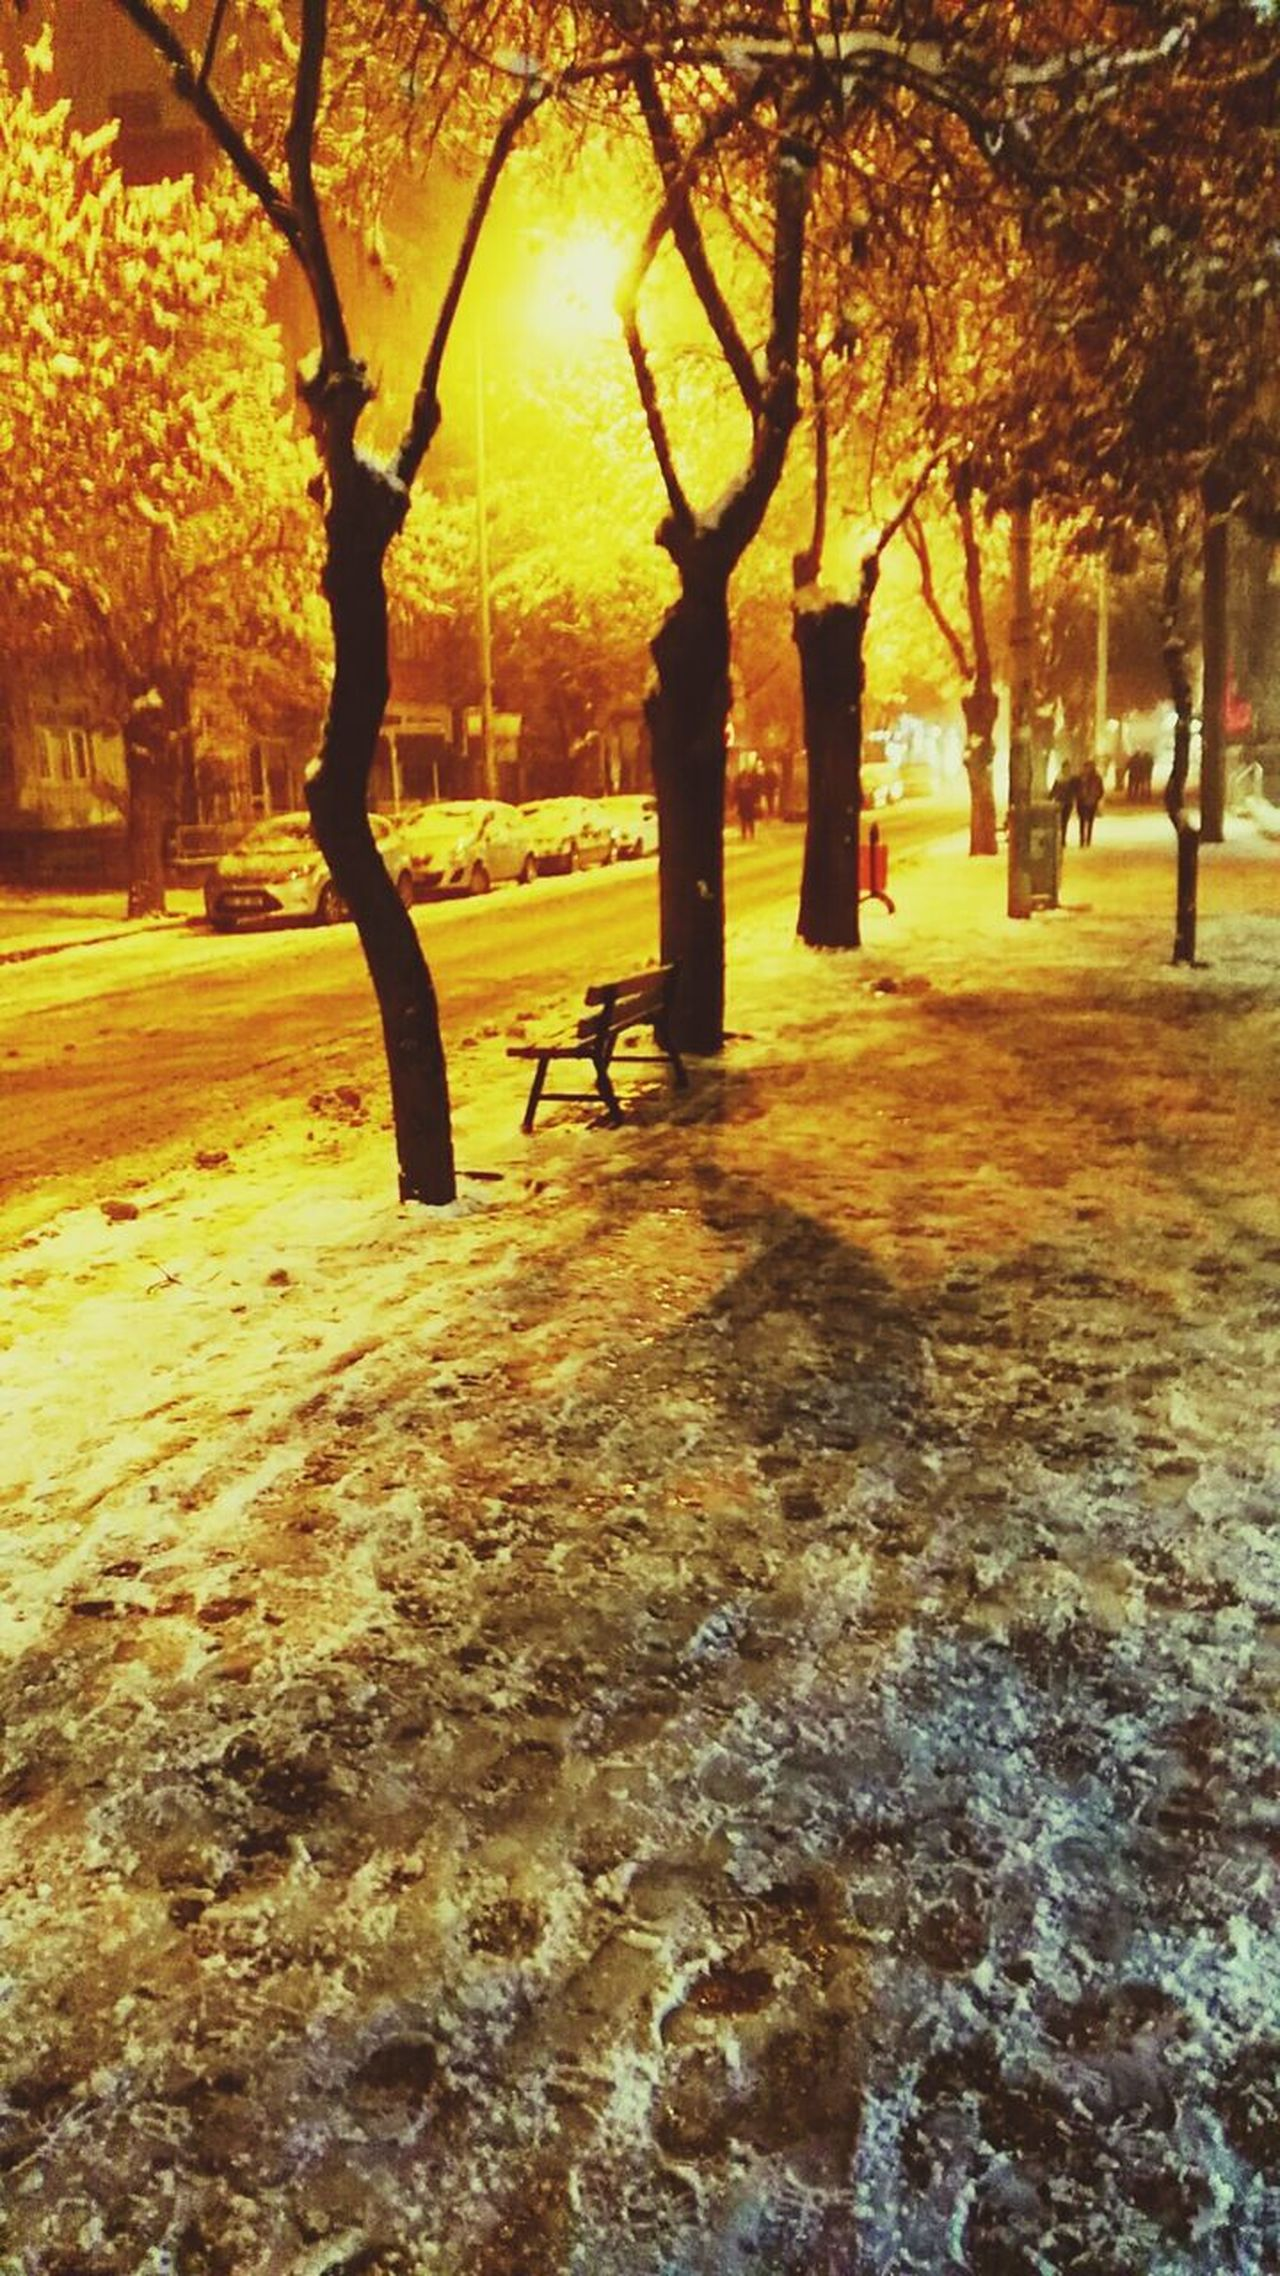 Snow ❄ Snowing Winter Cold Temperature Snow Walk Turkey Burdur No People Streetphotography Night